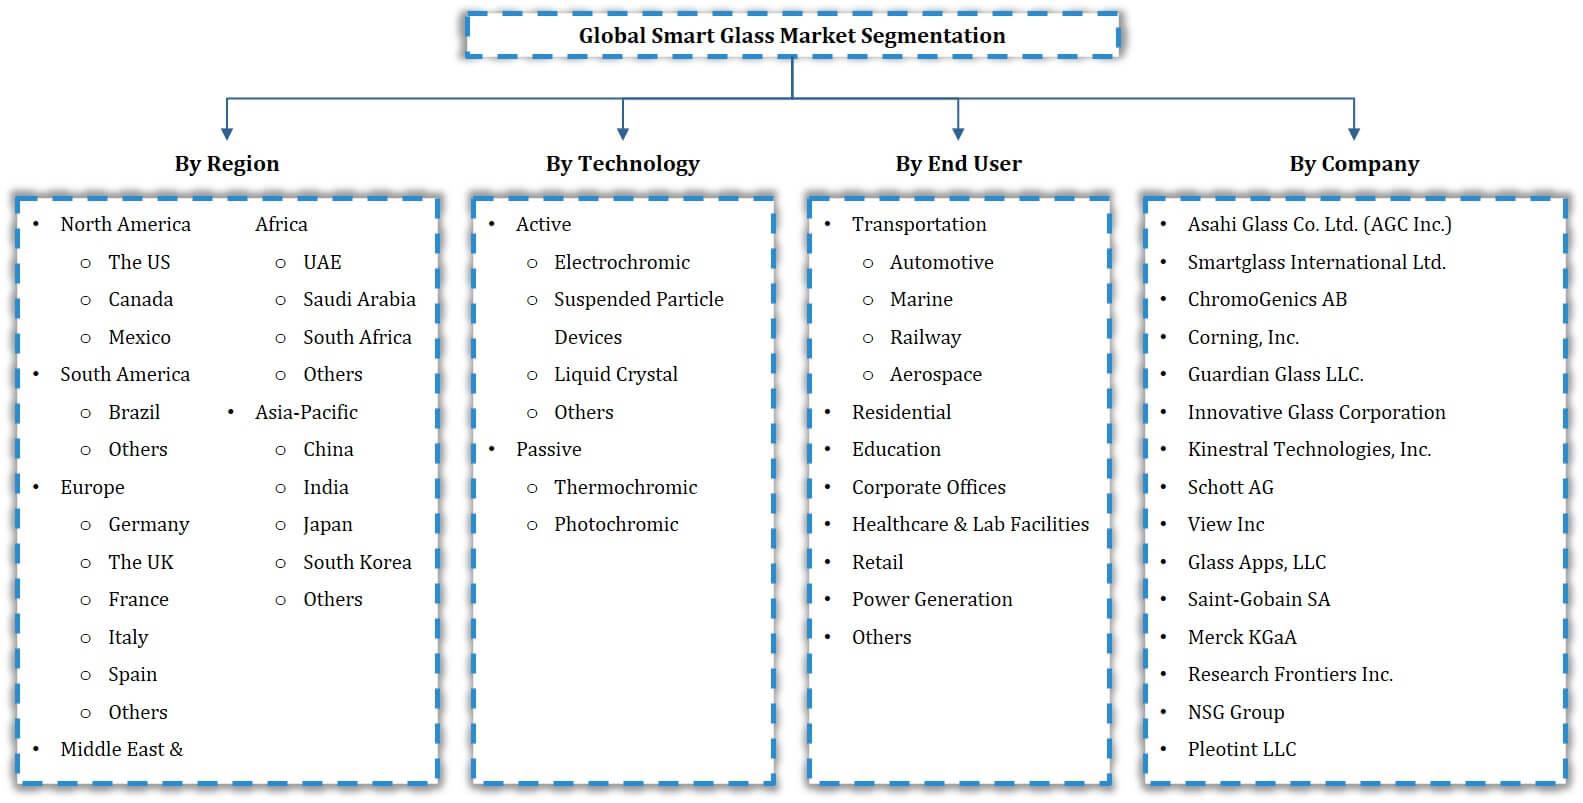 Global Smart Glass Market Segmentation